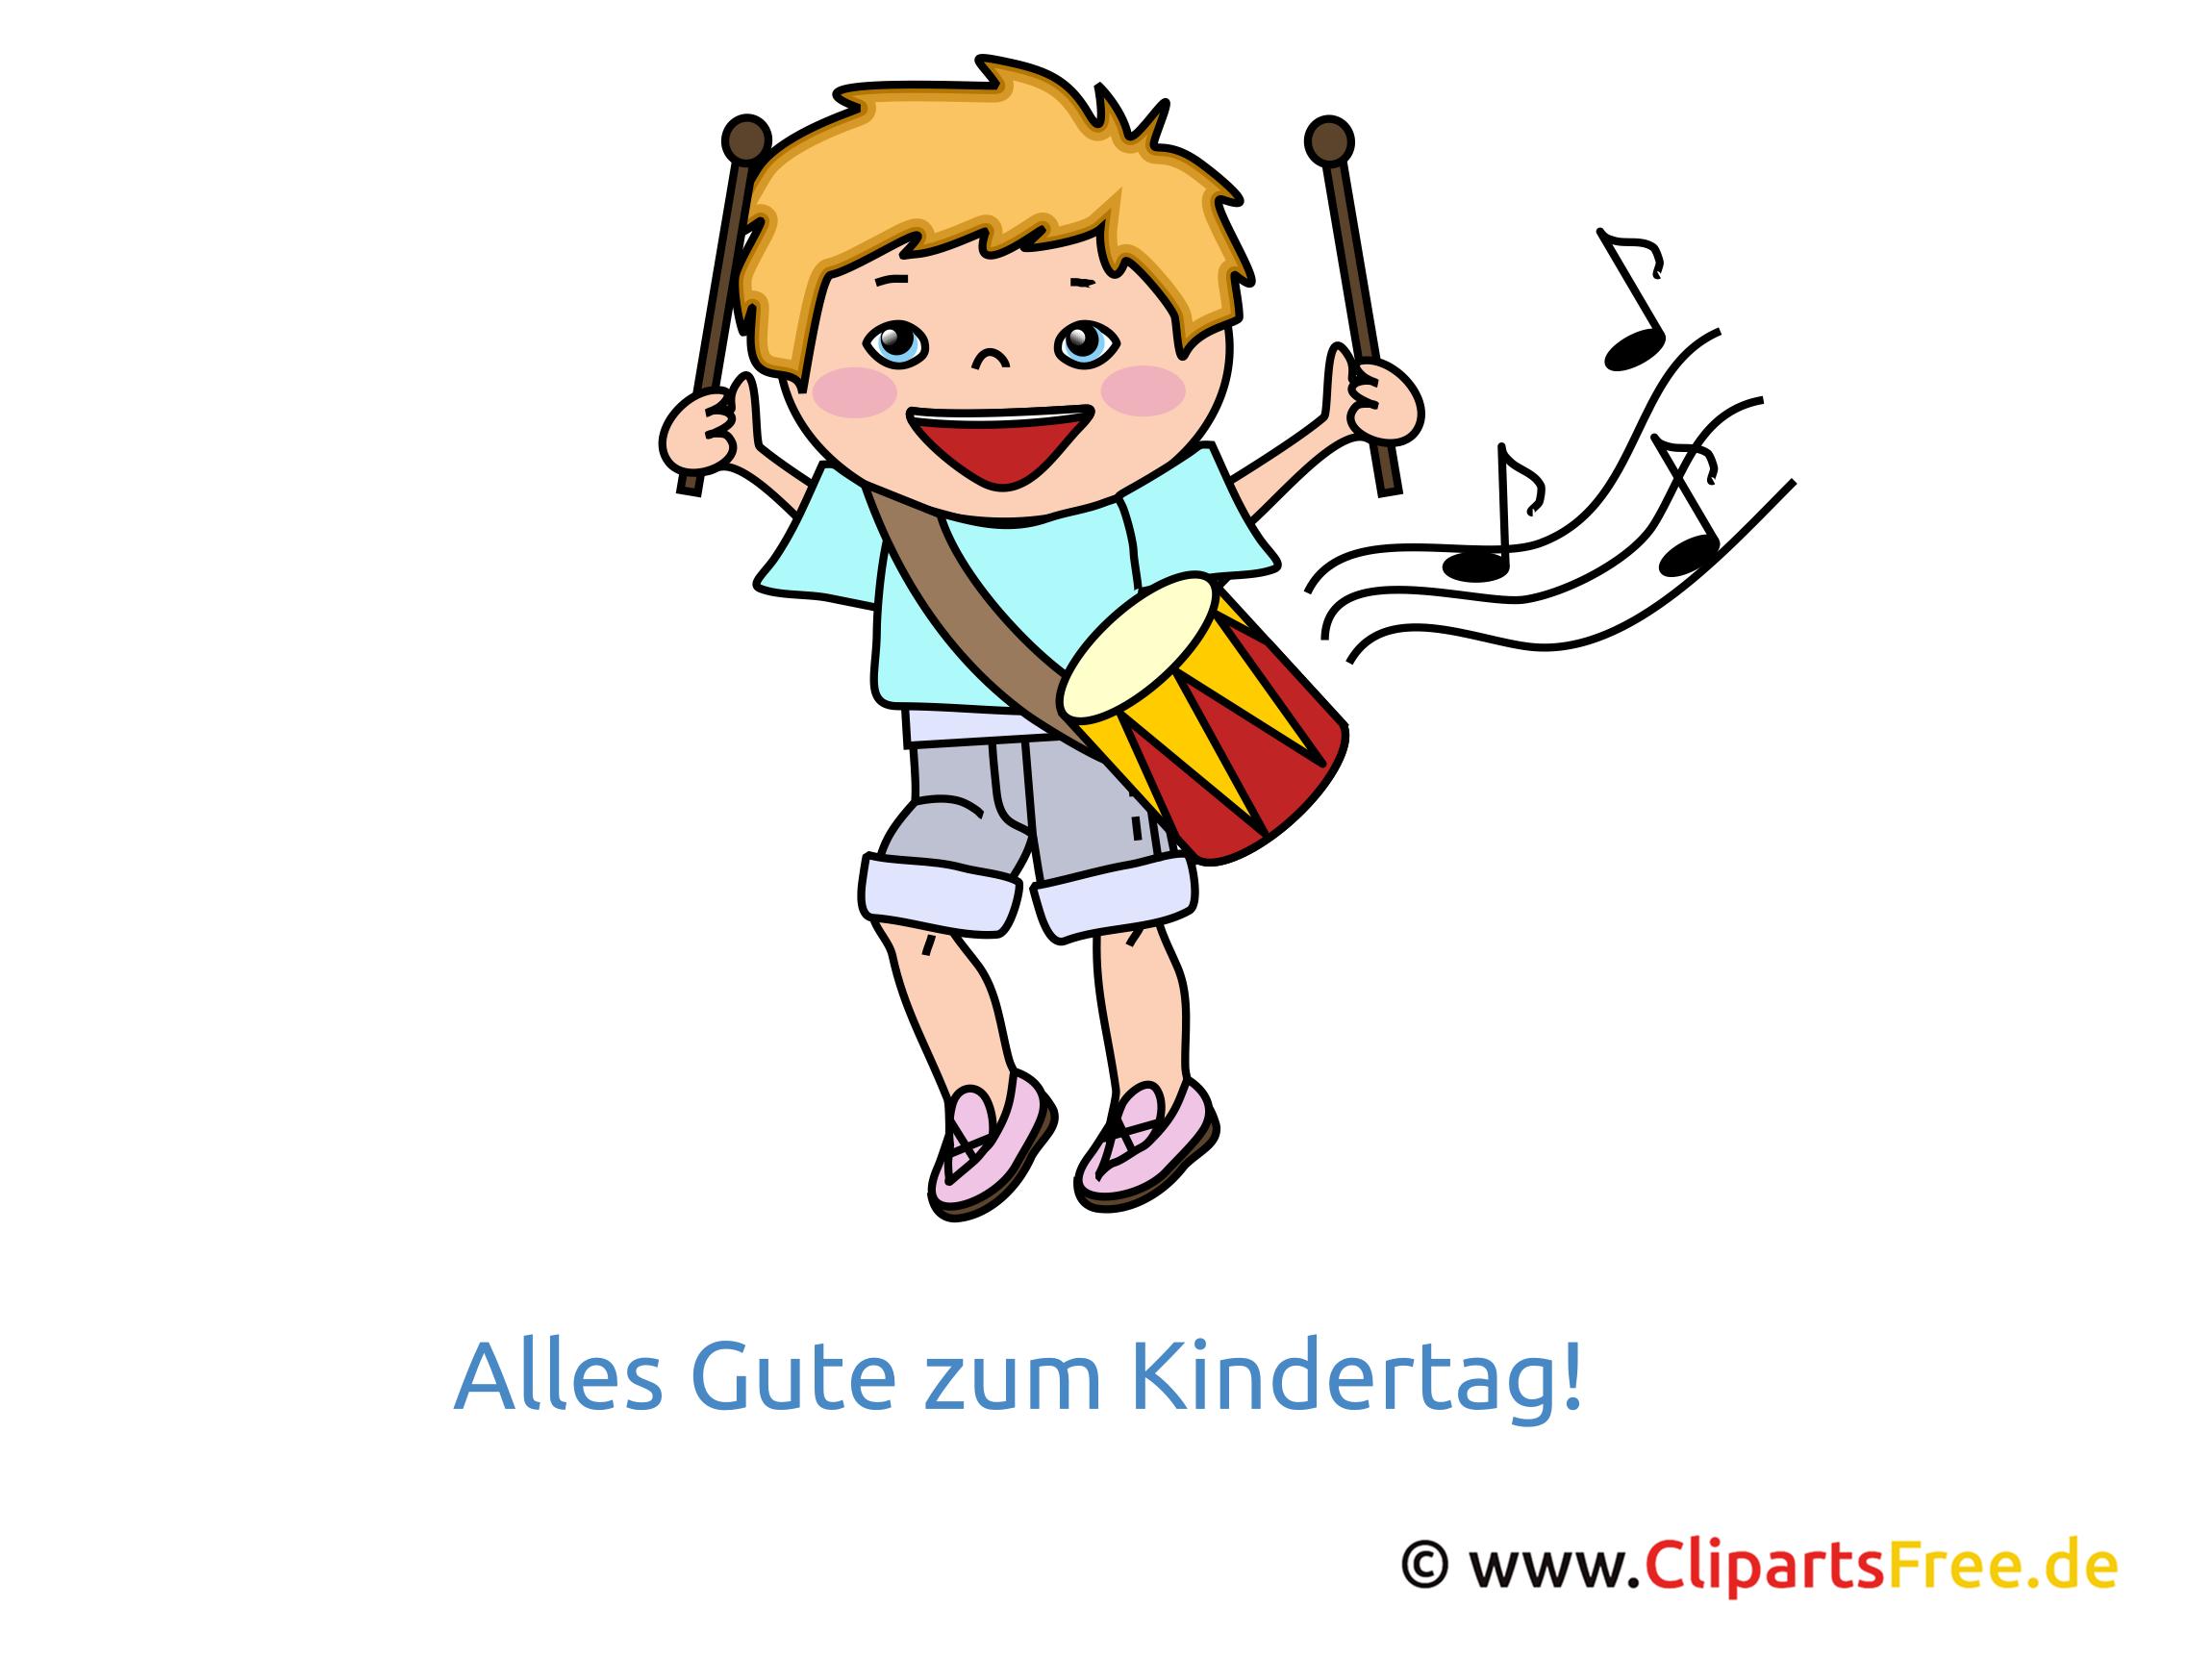 clipart kostenlos kindertag - photo #4